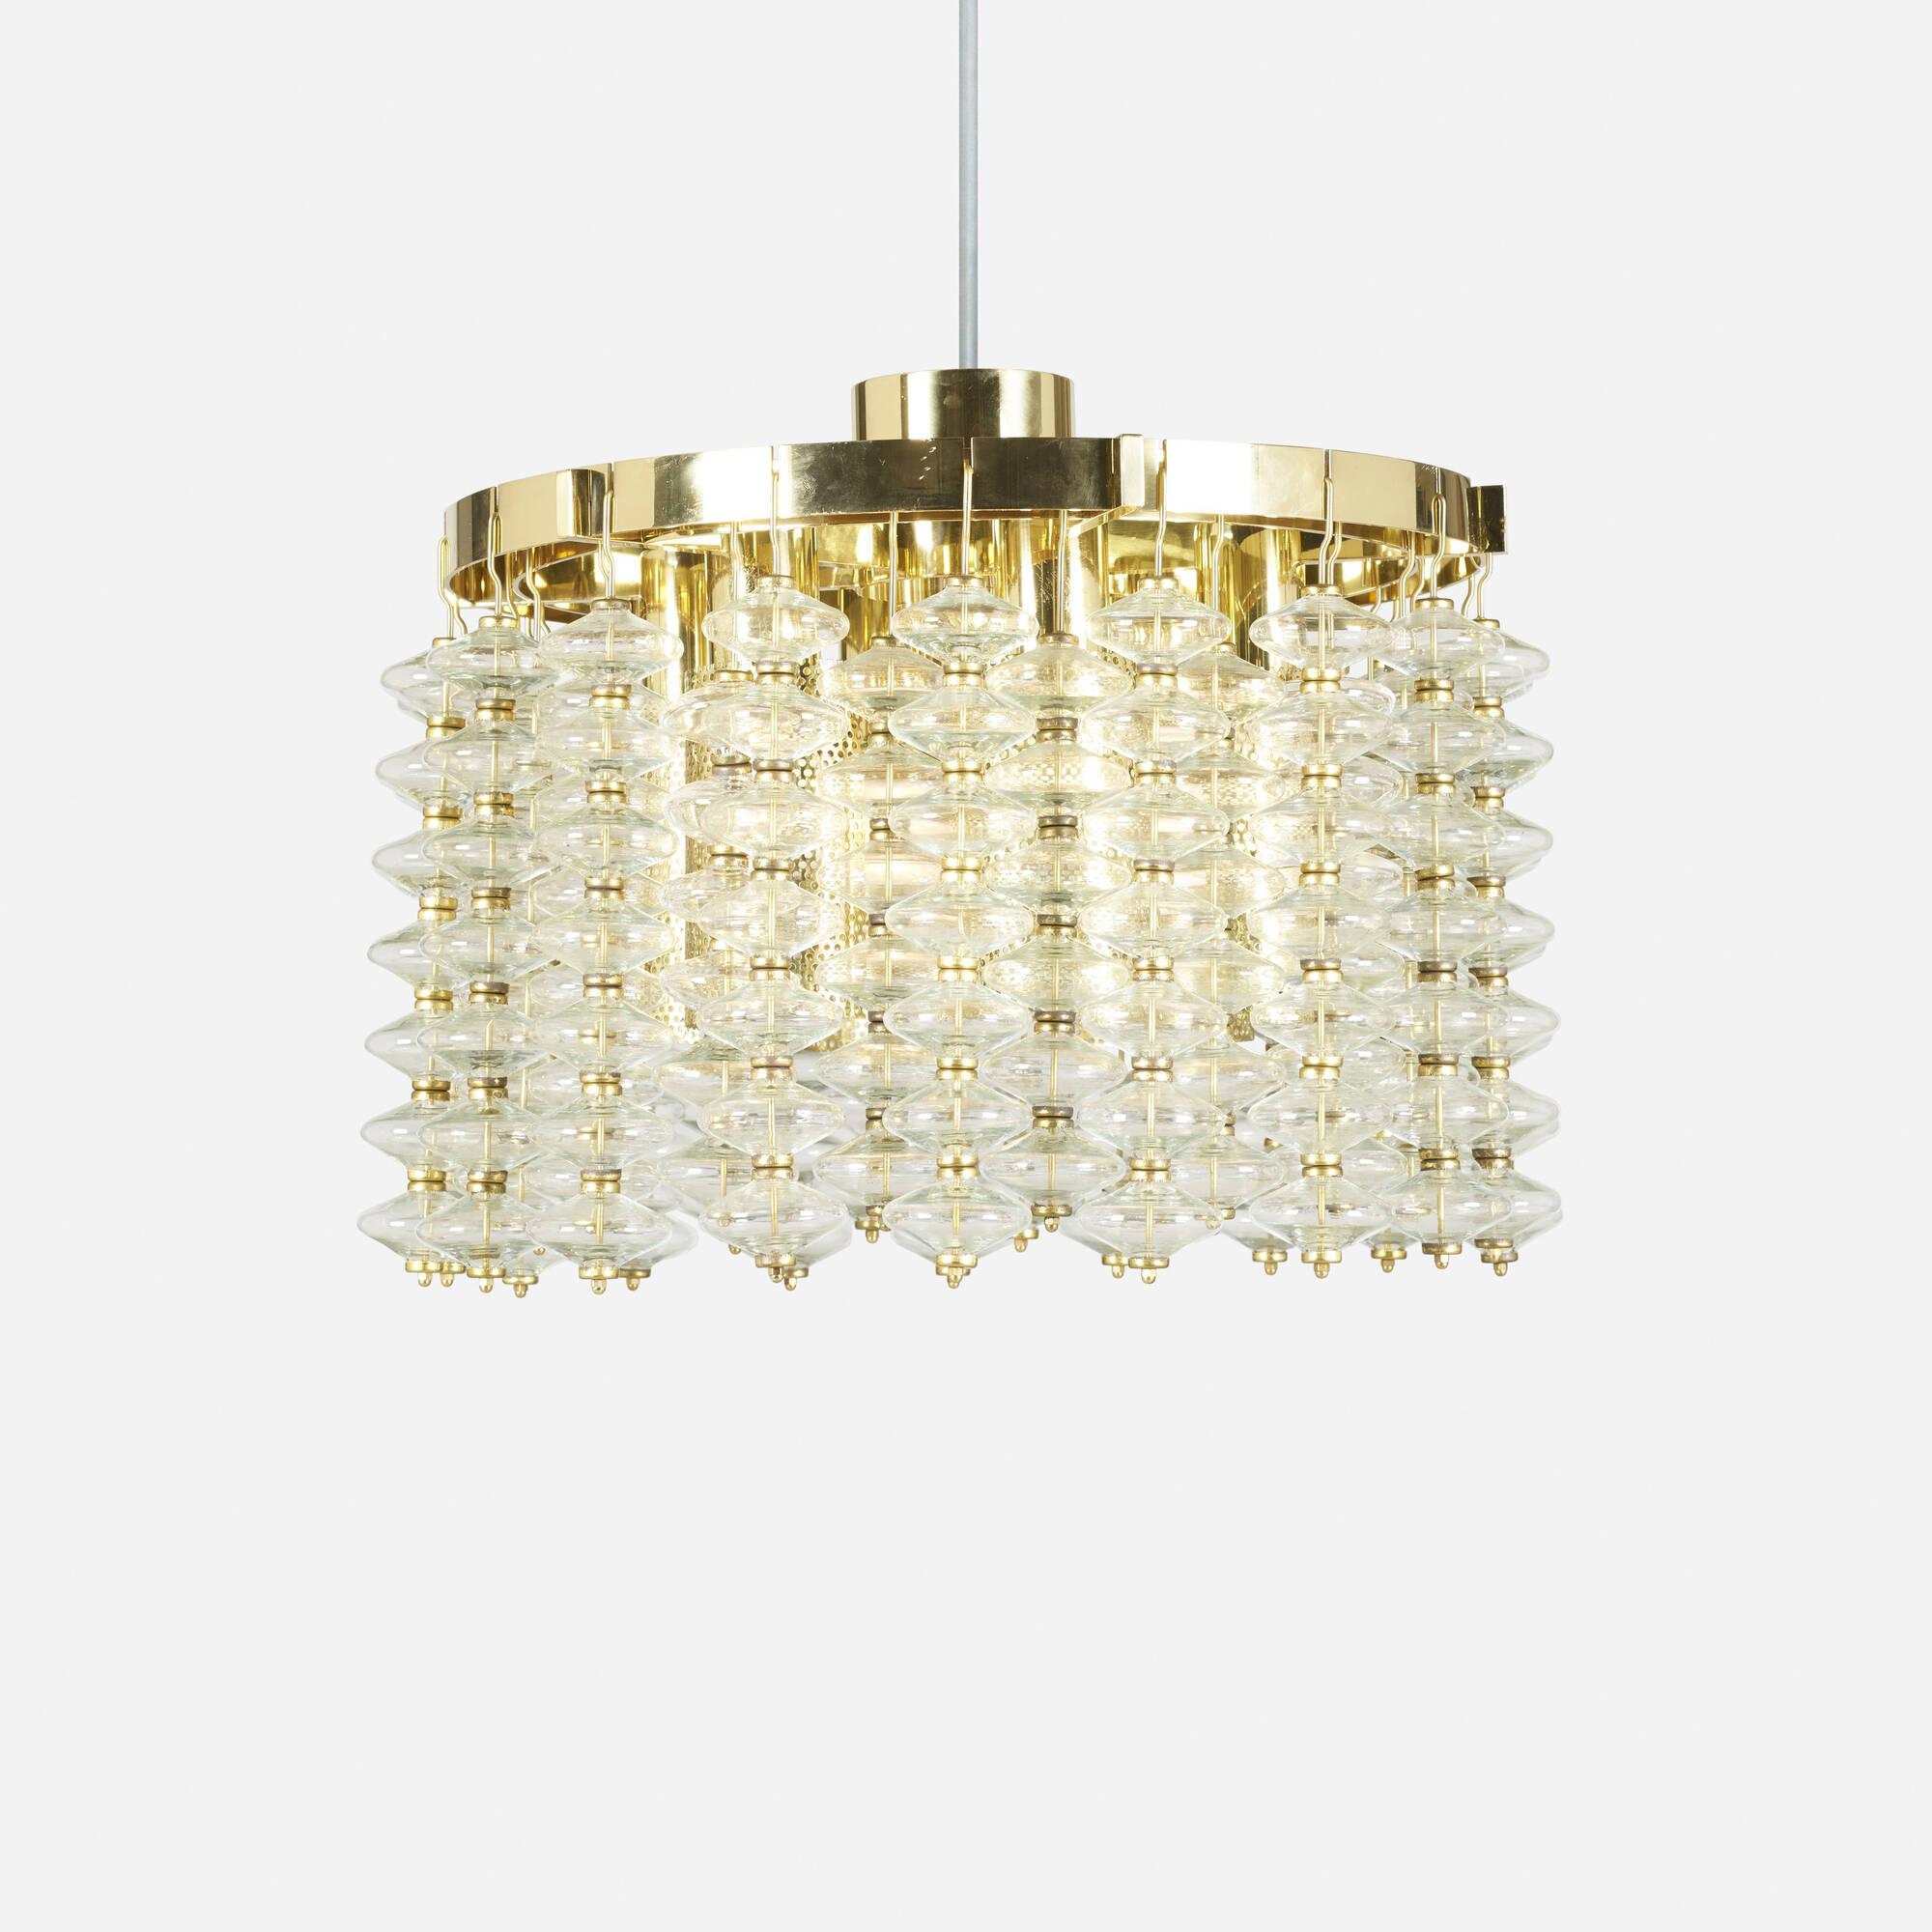 186: Hans-Agne Jakobsson / chandelier (2 of 3)